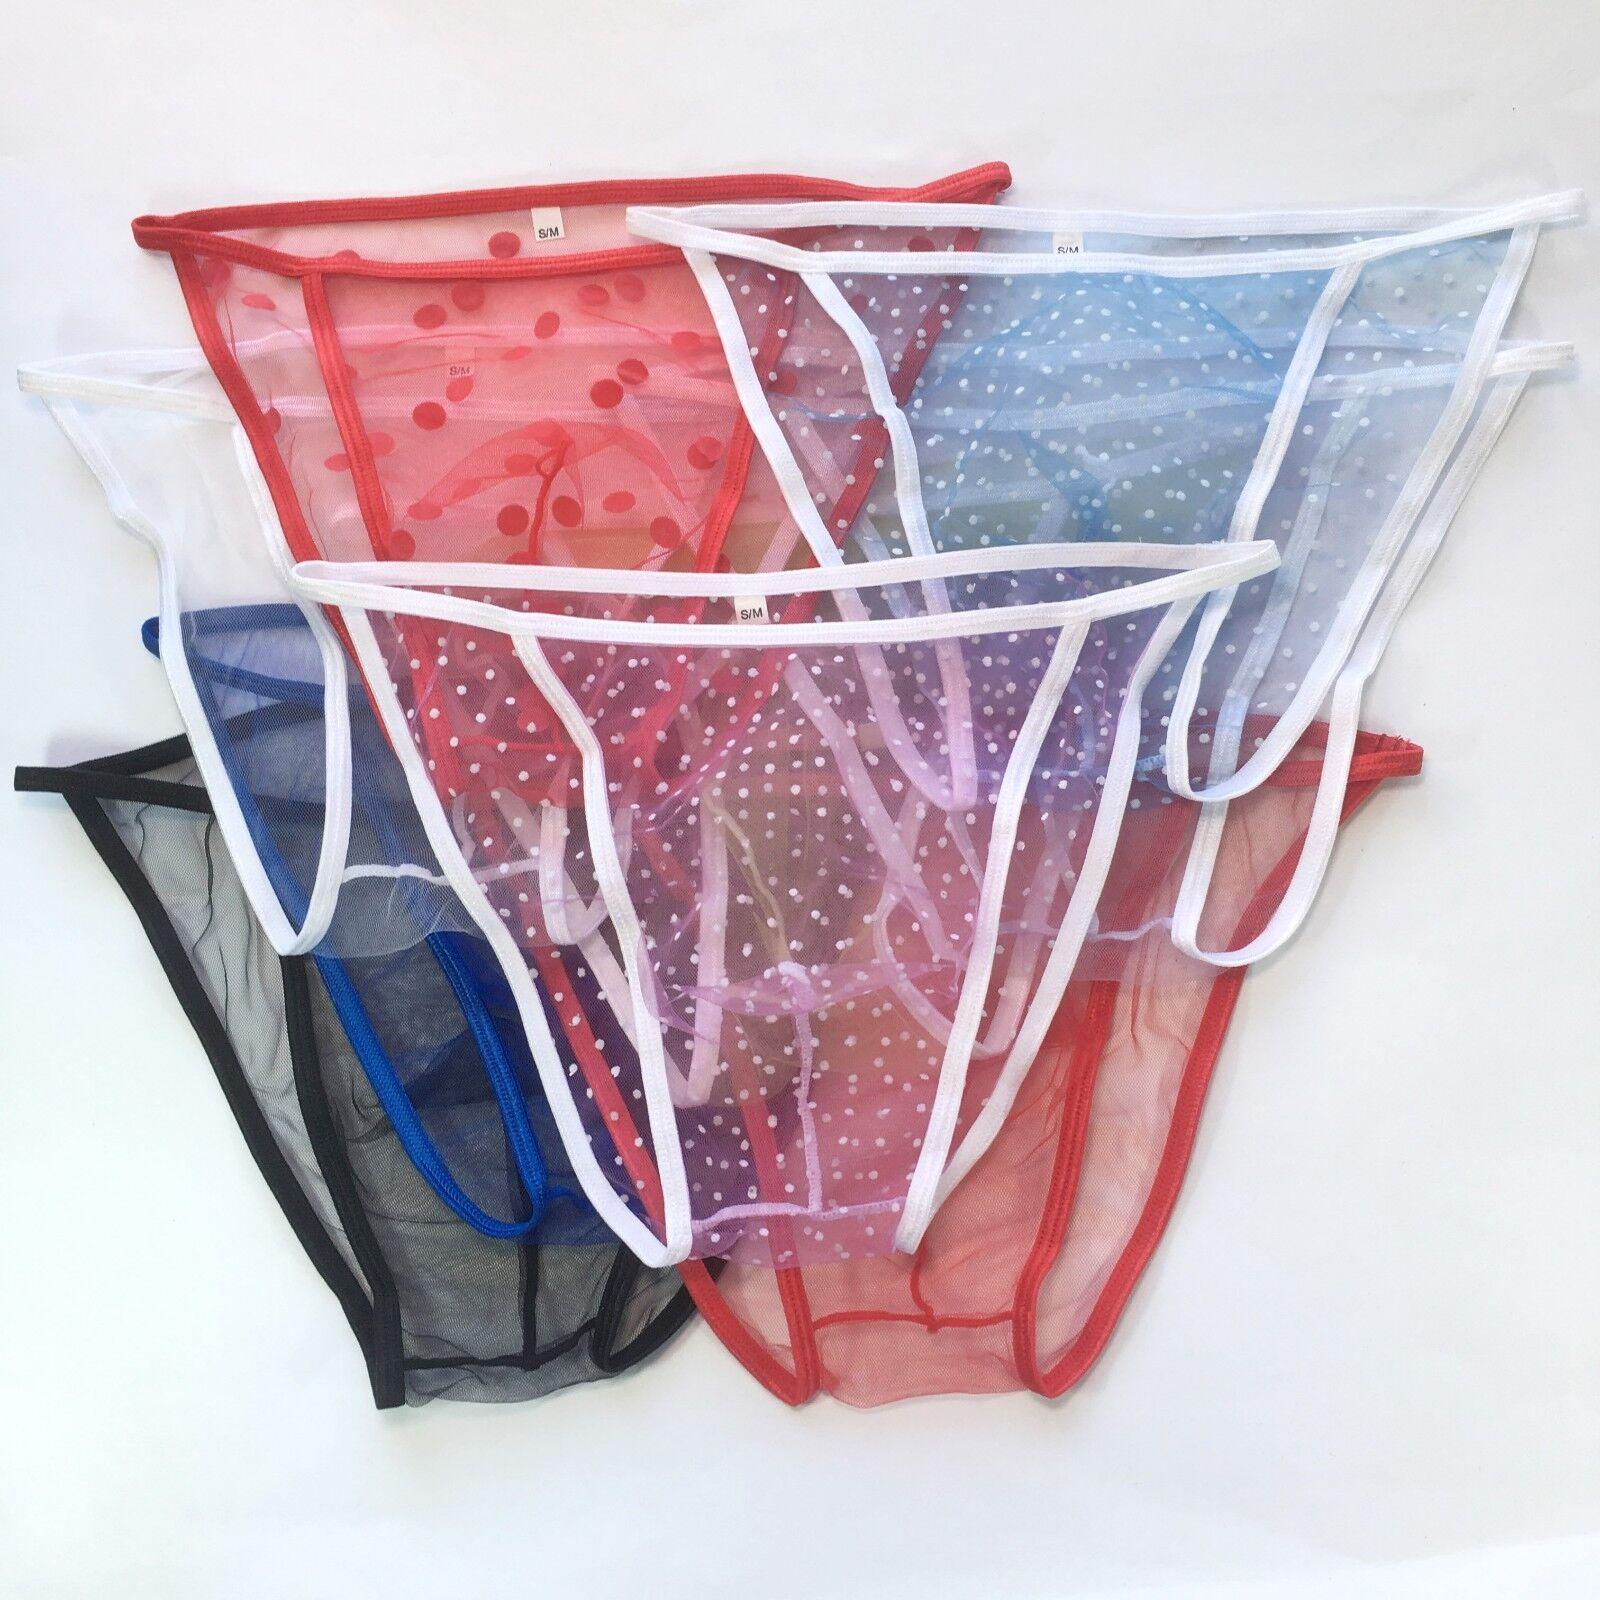 K3429 K342 Mens String Bikini Contoured Pouch stretchy C-thru Sheer Mesh Tulle